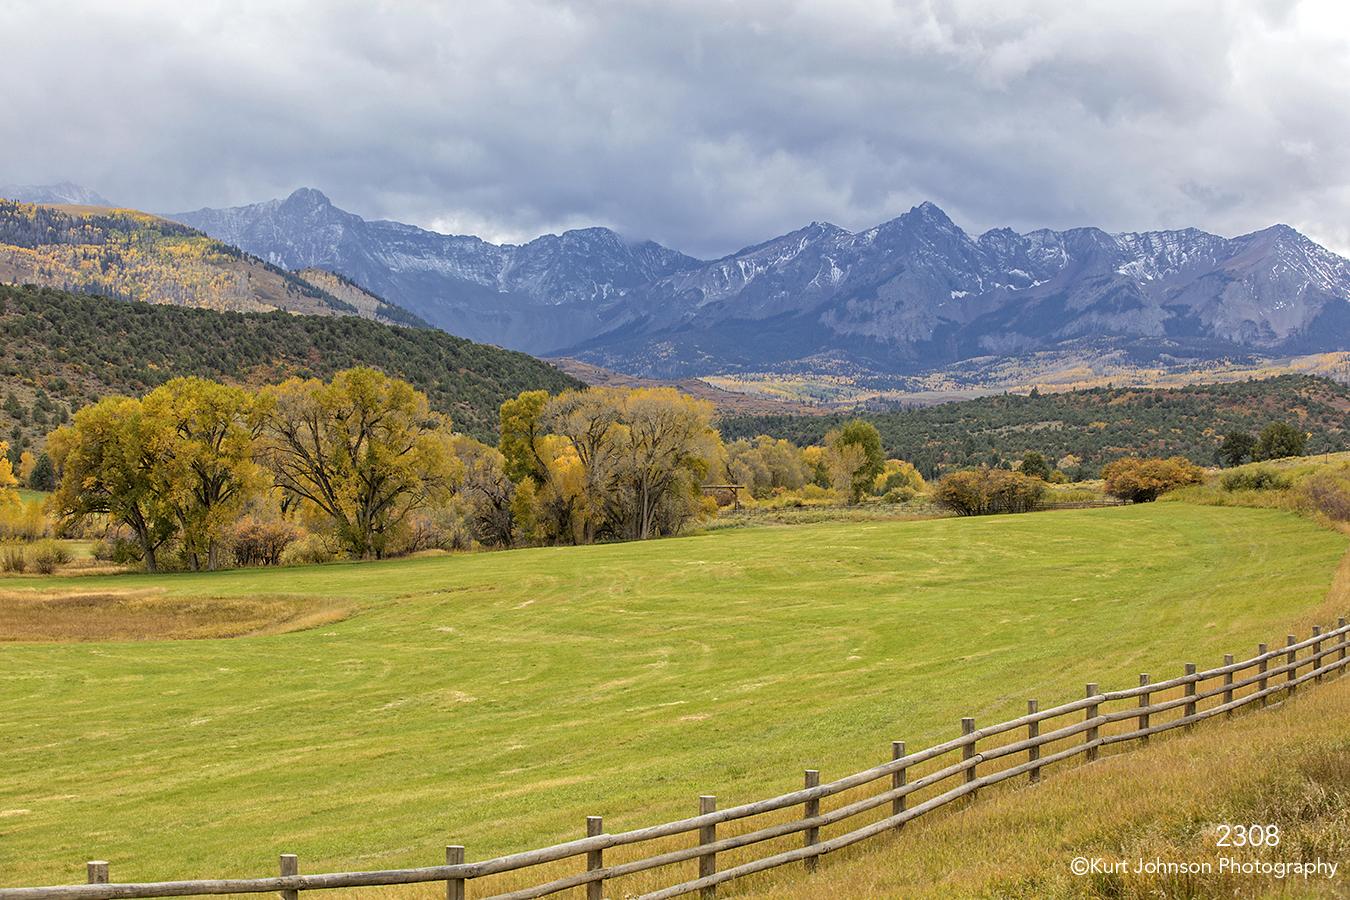 landscape mountains fence trees clouds colorado grasses